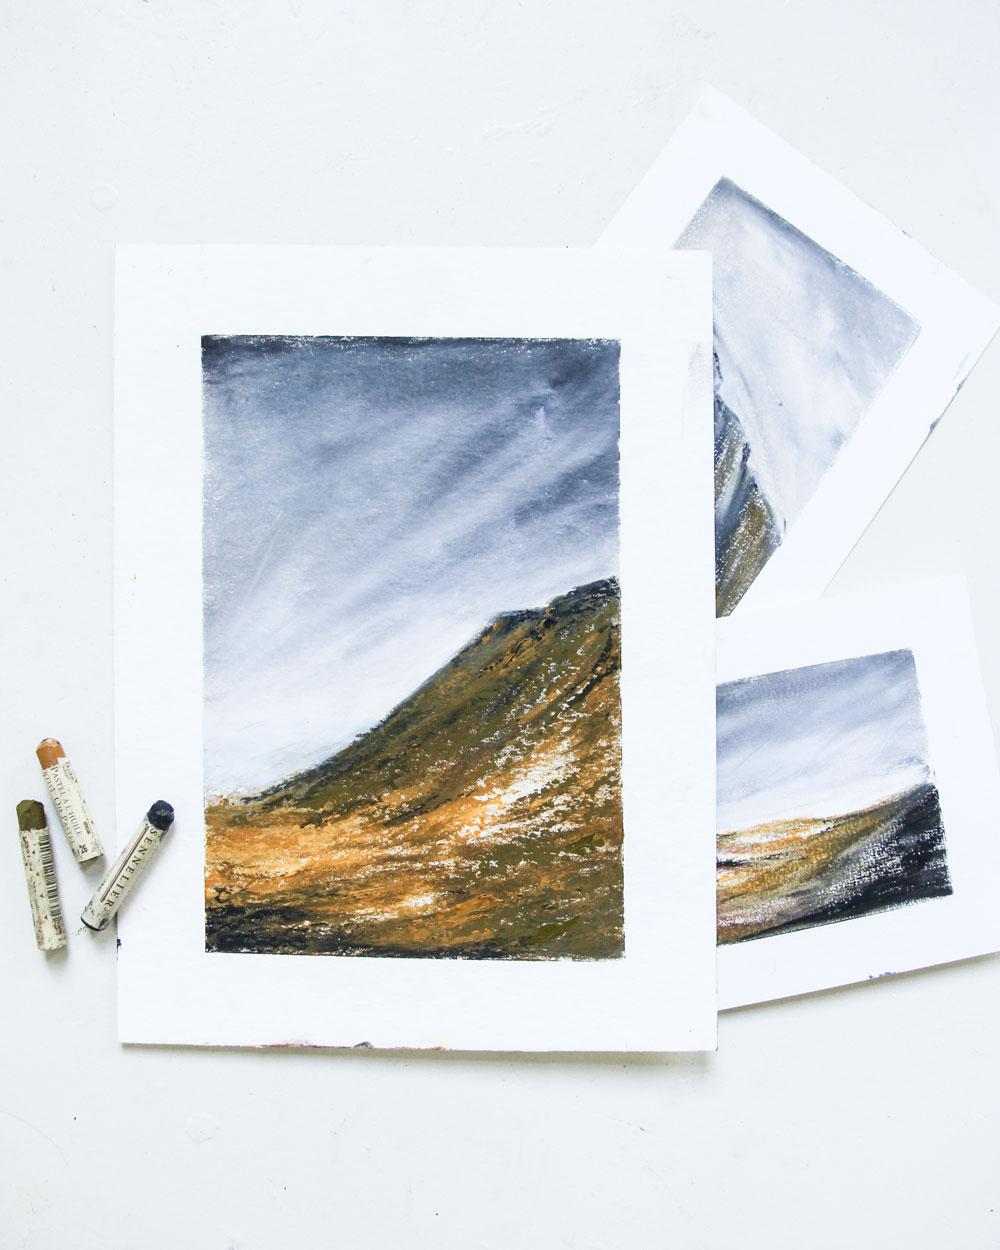 The Four Elements Årvik   16 x 23,5 cm   - sold -